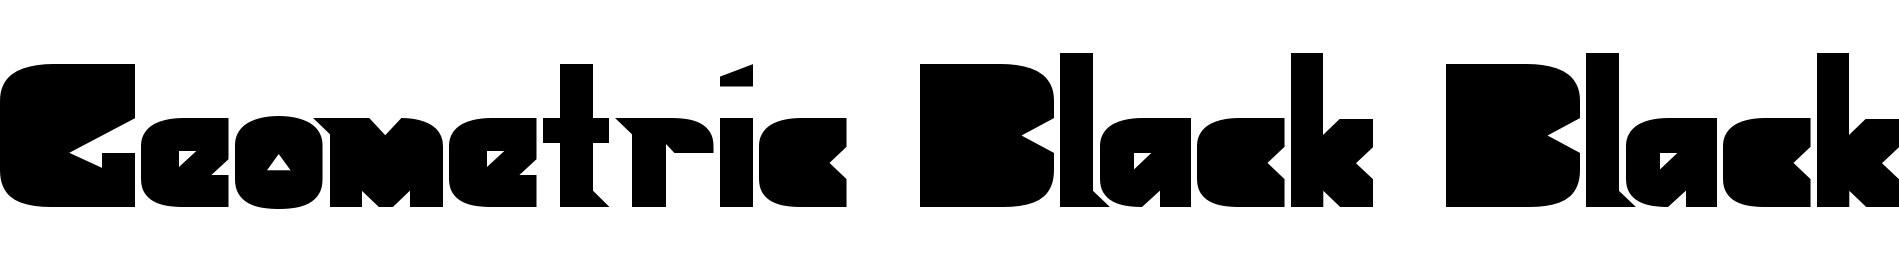 Geometric Black Black